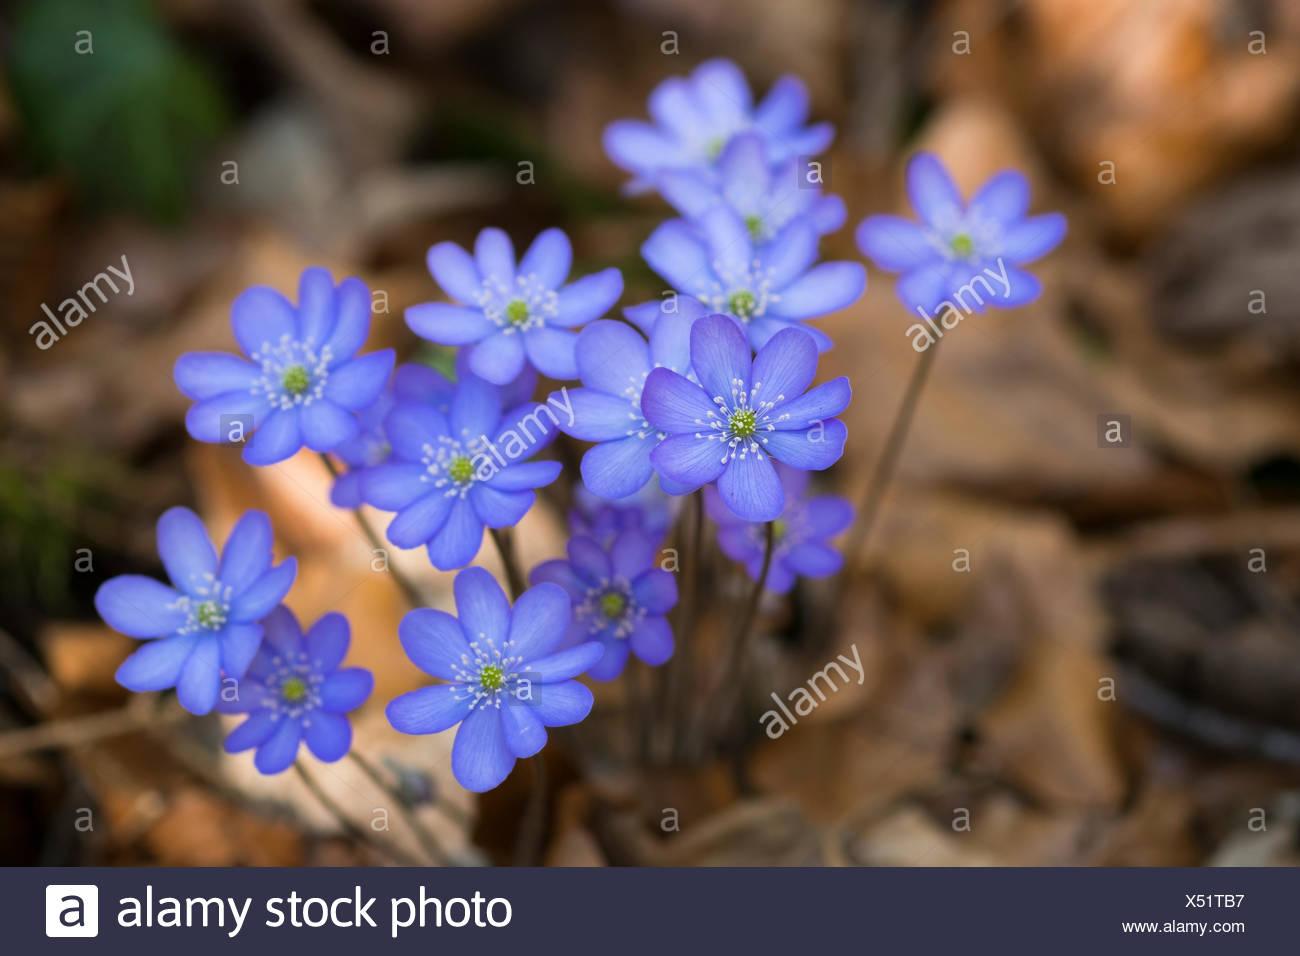 Blüten, Leberblümchen (Hepatica nobilis), Oberbayern, Bayern, Deutschland, Frühling - Stock Image